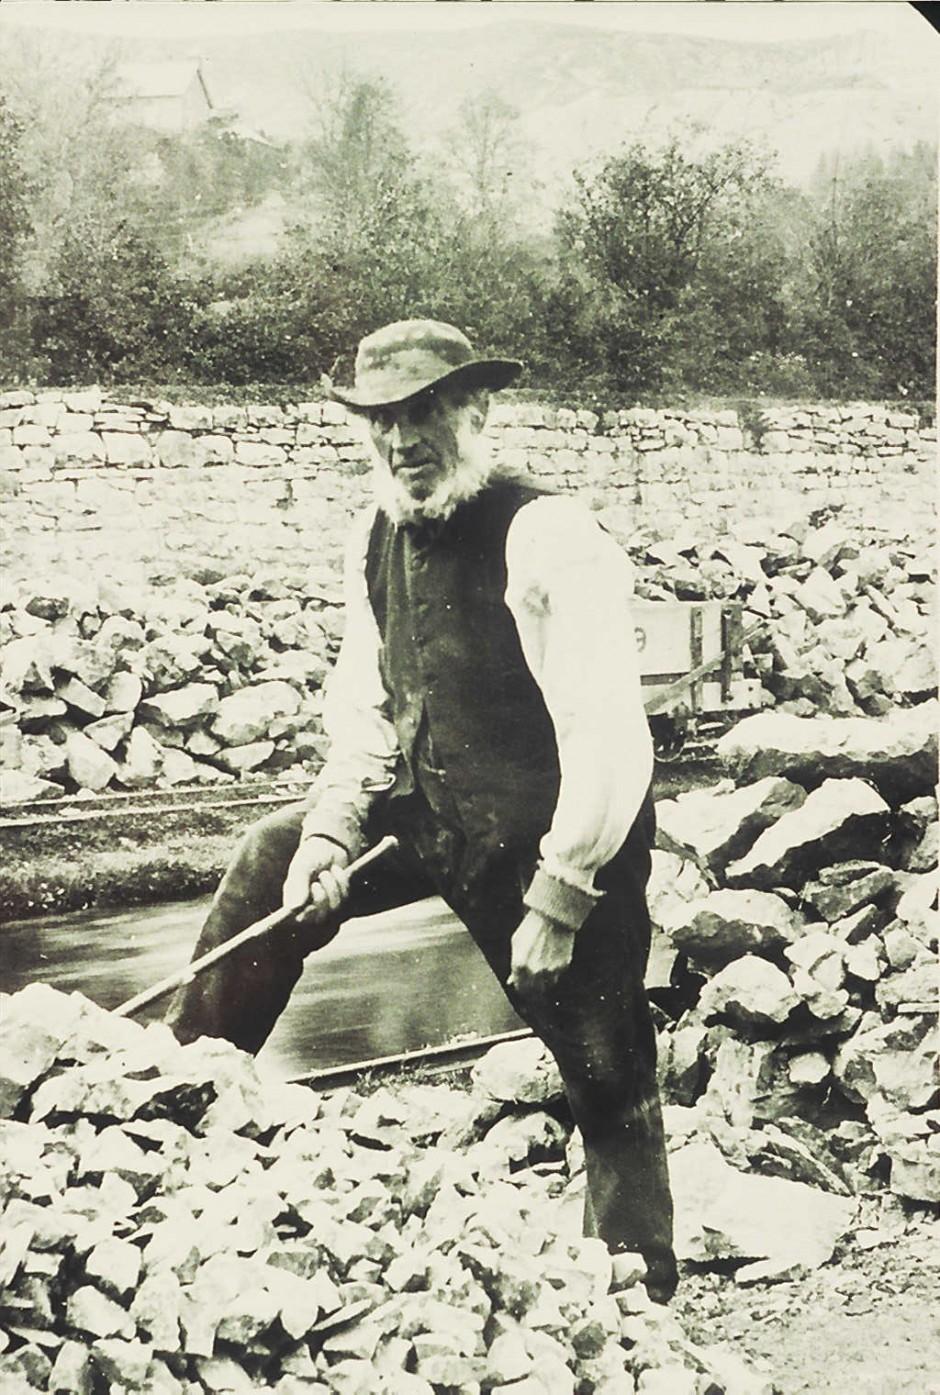 NM-L-19-24 - John Roberts, foreman, grading limestone